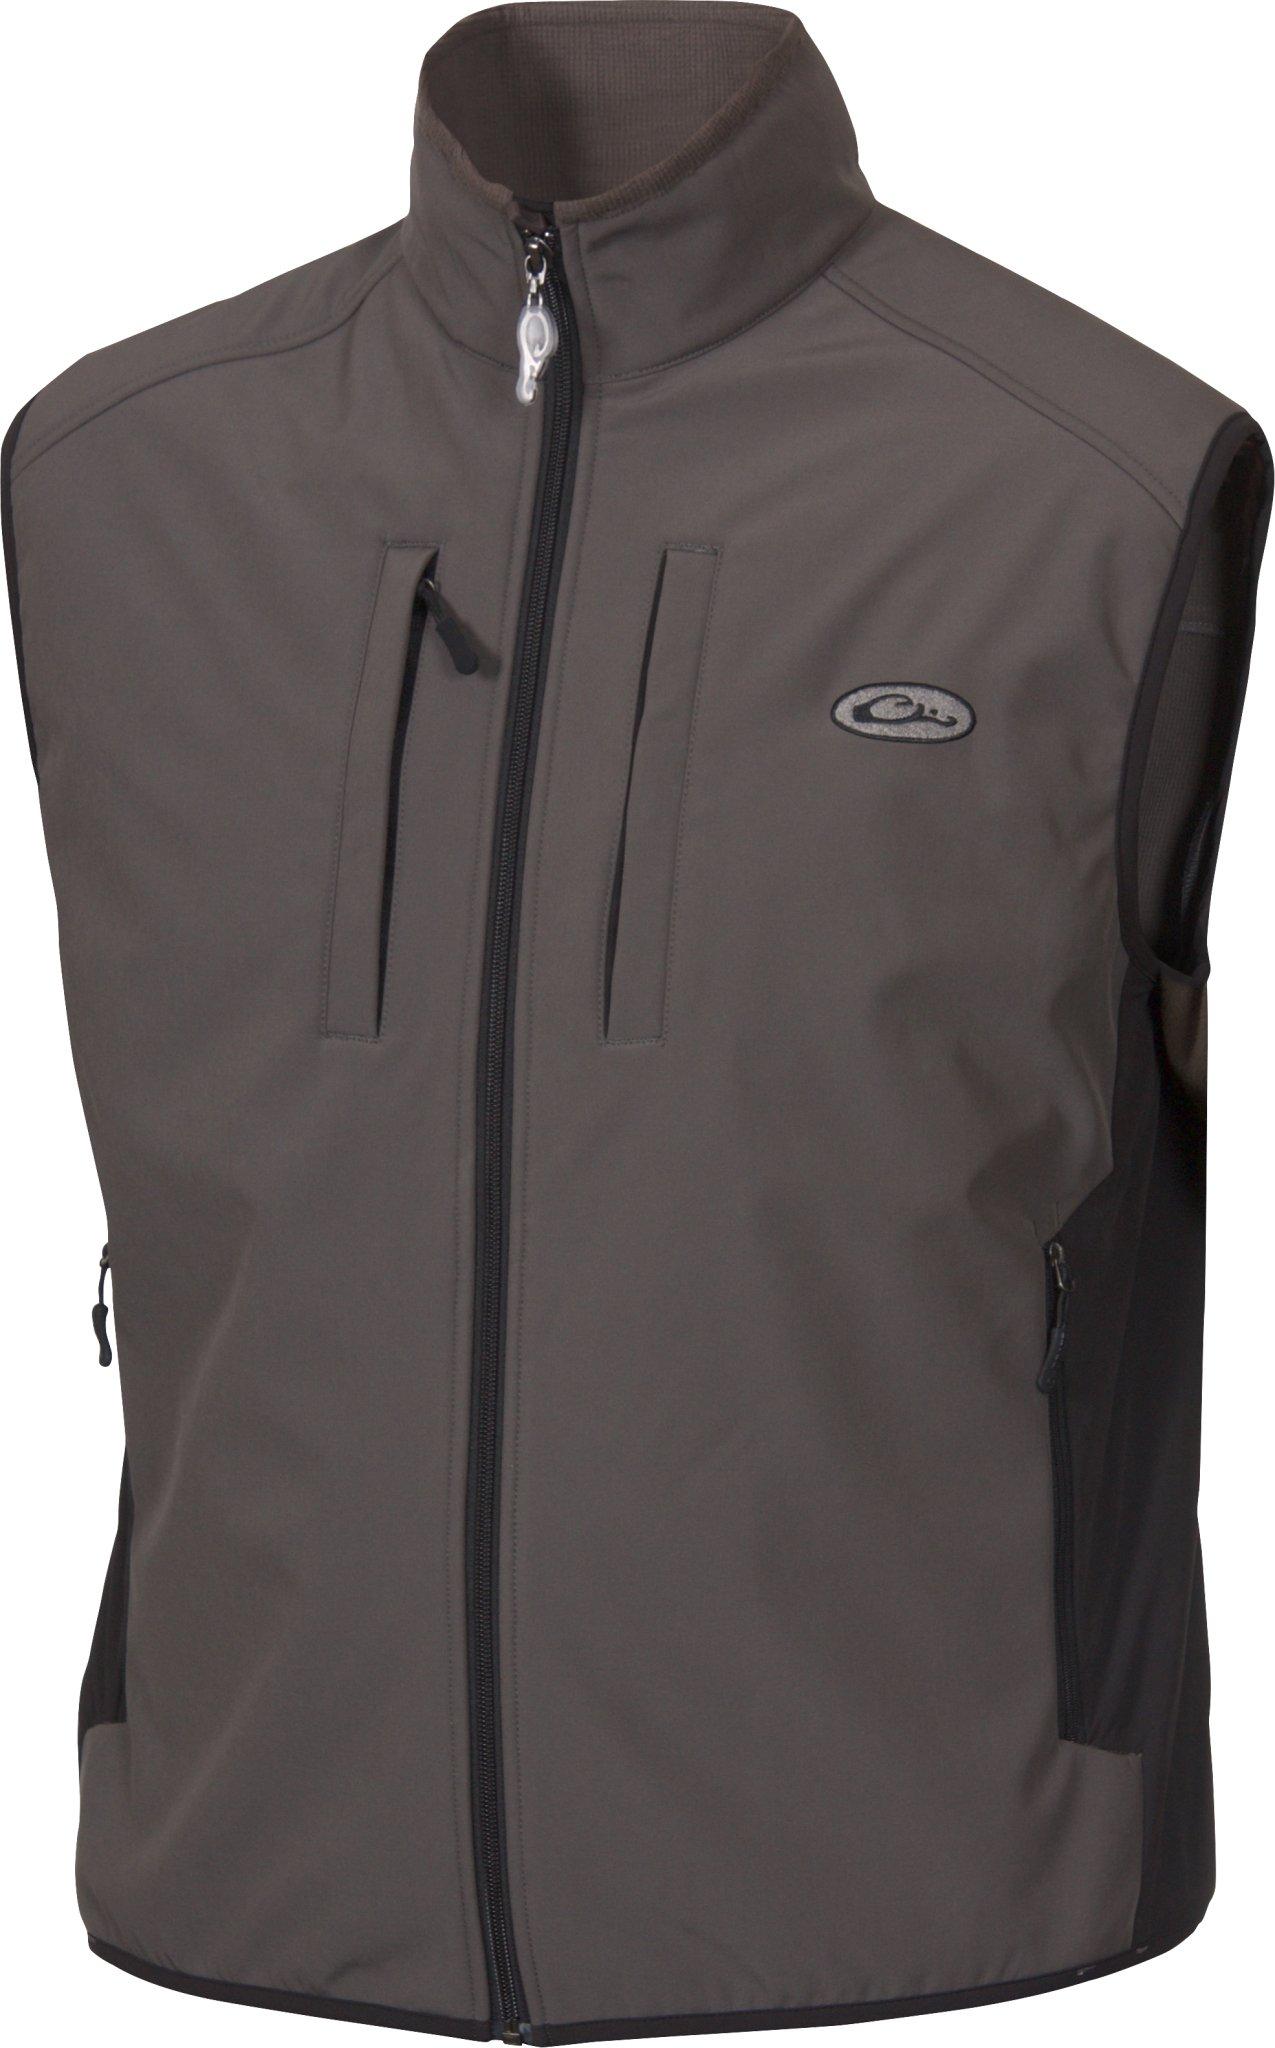 Drake Windproof Tech Gray Vest, Small